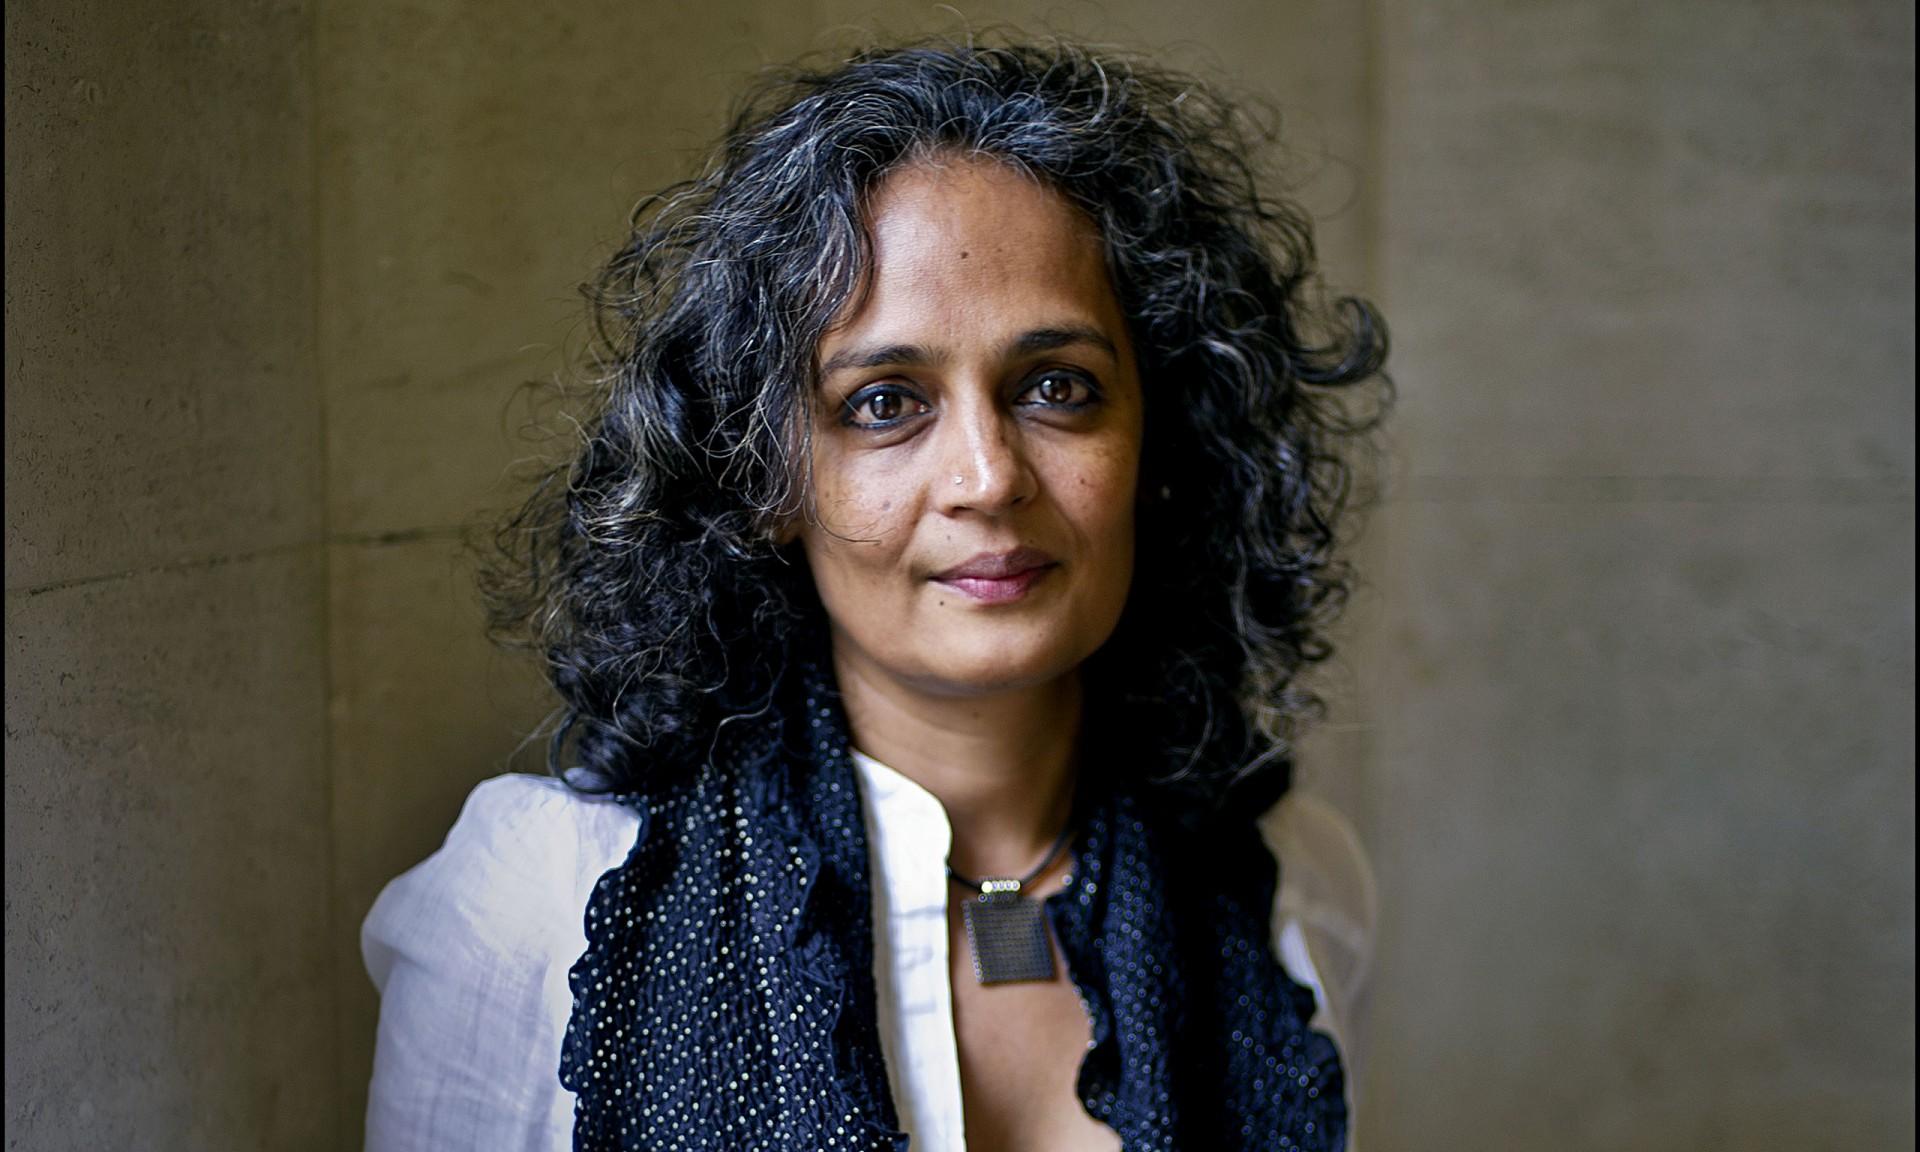 012 One2 Essay Example Essays By Arundhati Sensational Roy 1920